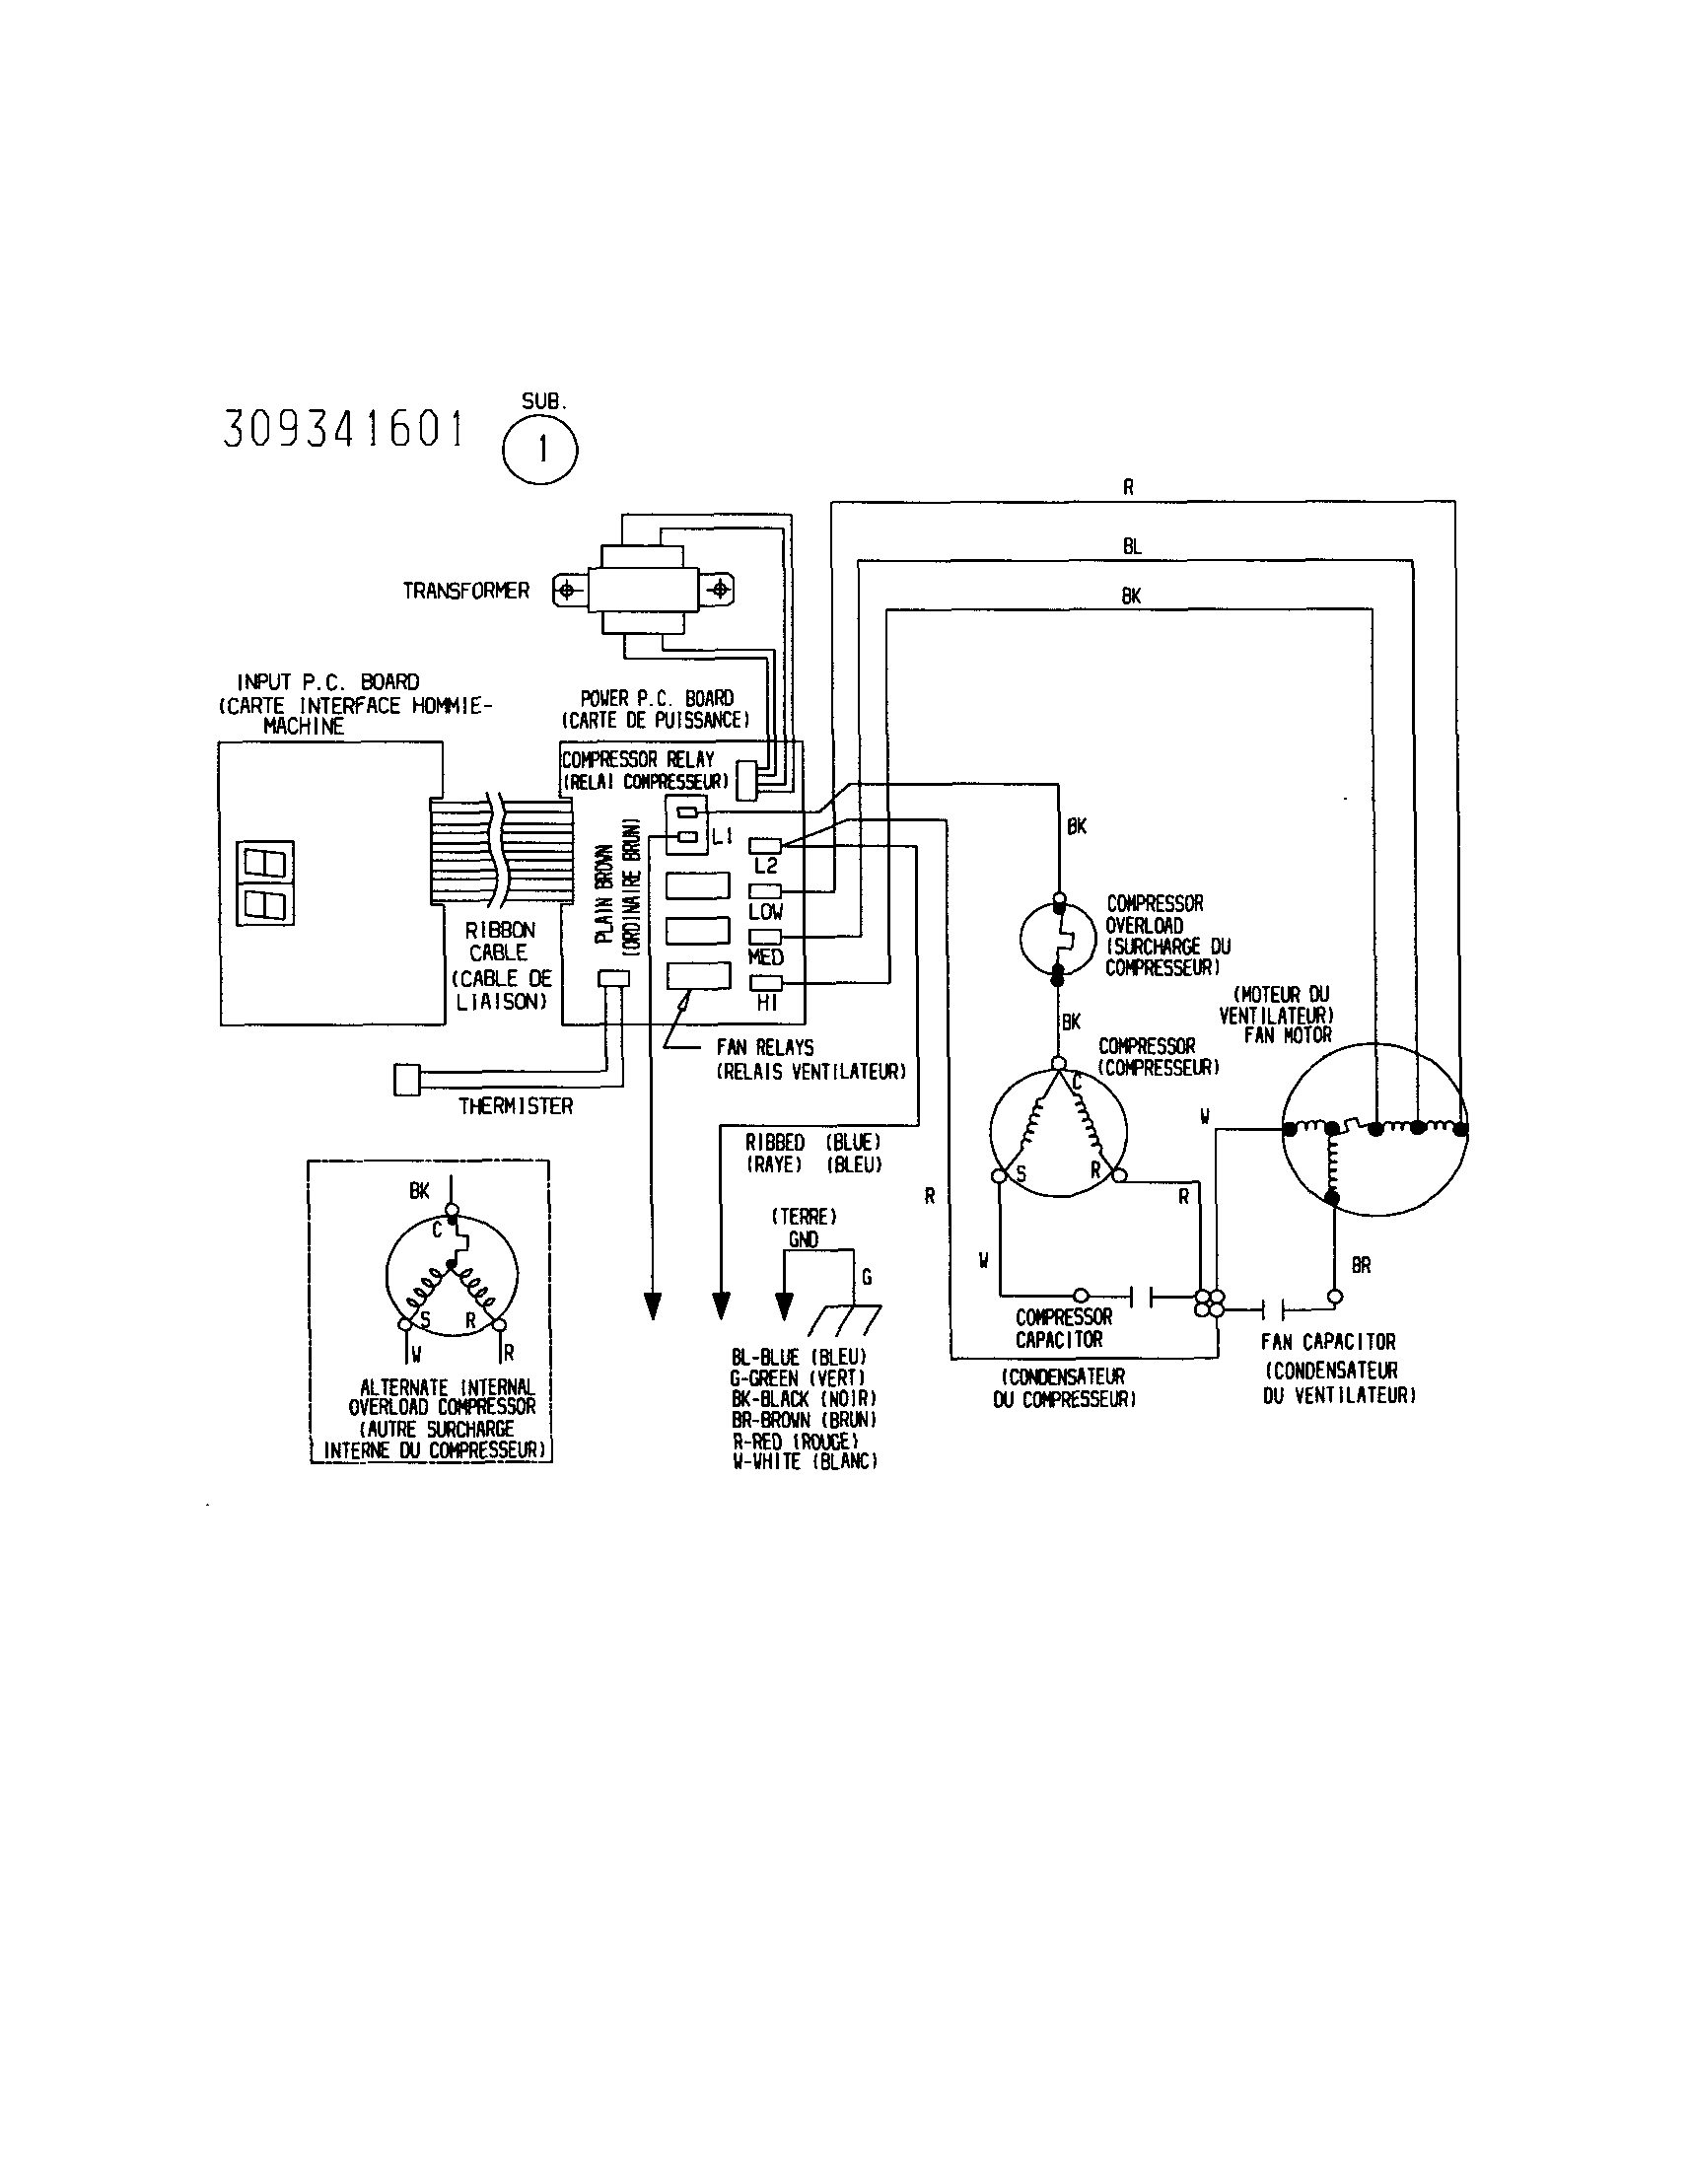 Dayton Diagram Wiring Heater E A on